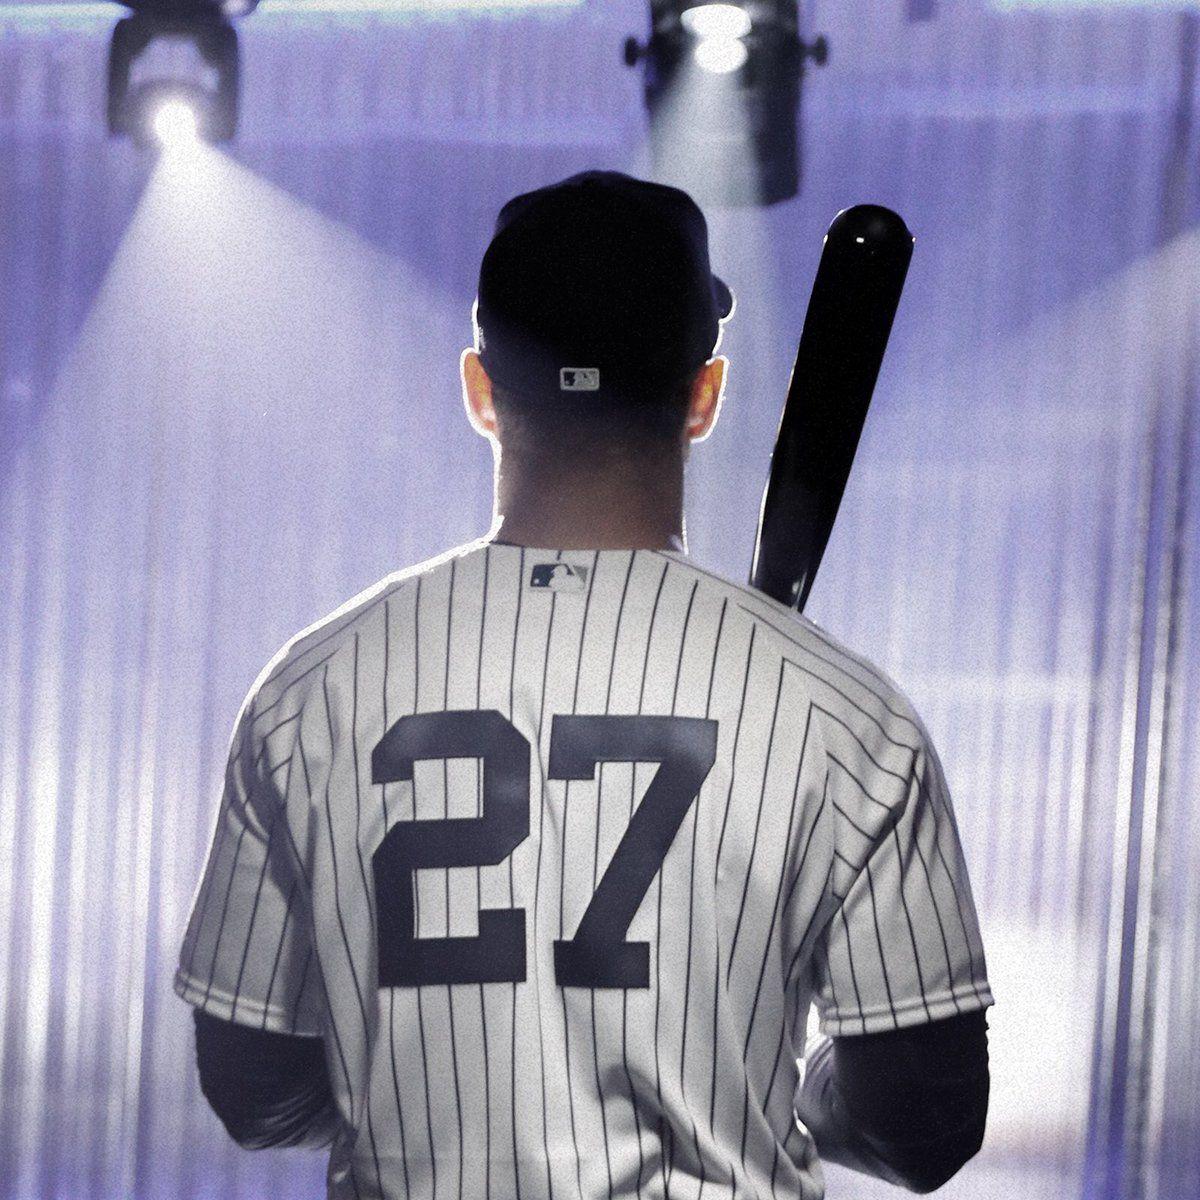 New York Yankees Verified Account Yankees Feb 18 Pinstripes Bright Lights Giancarlo Stanton 1 New York Yan With Images New York Yankees Yankees Giancarlo Stanton